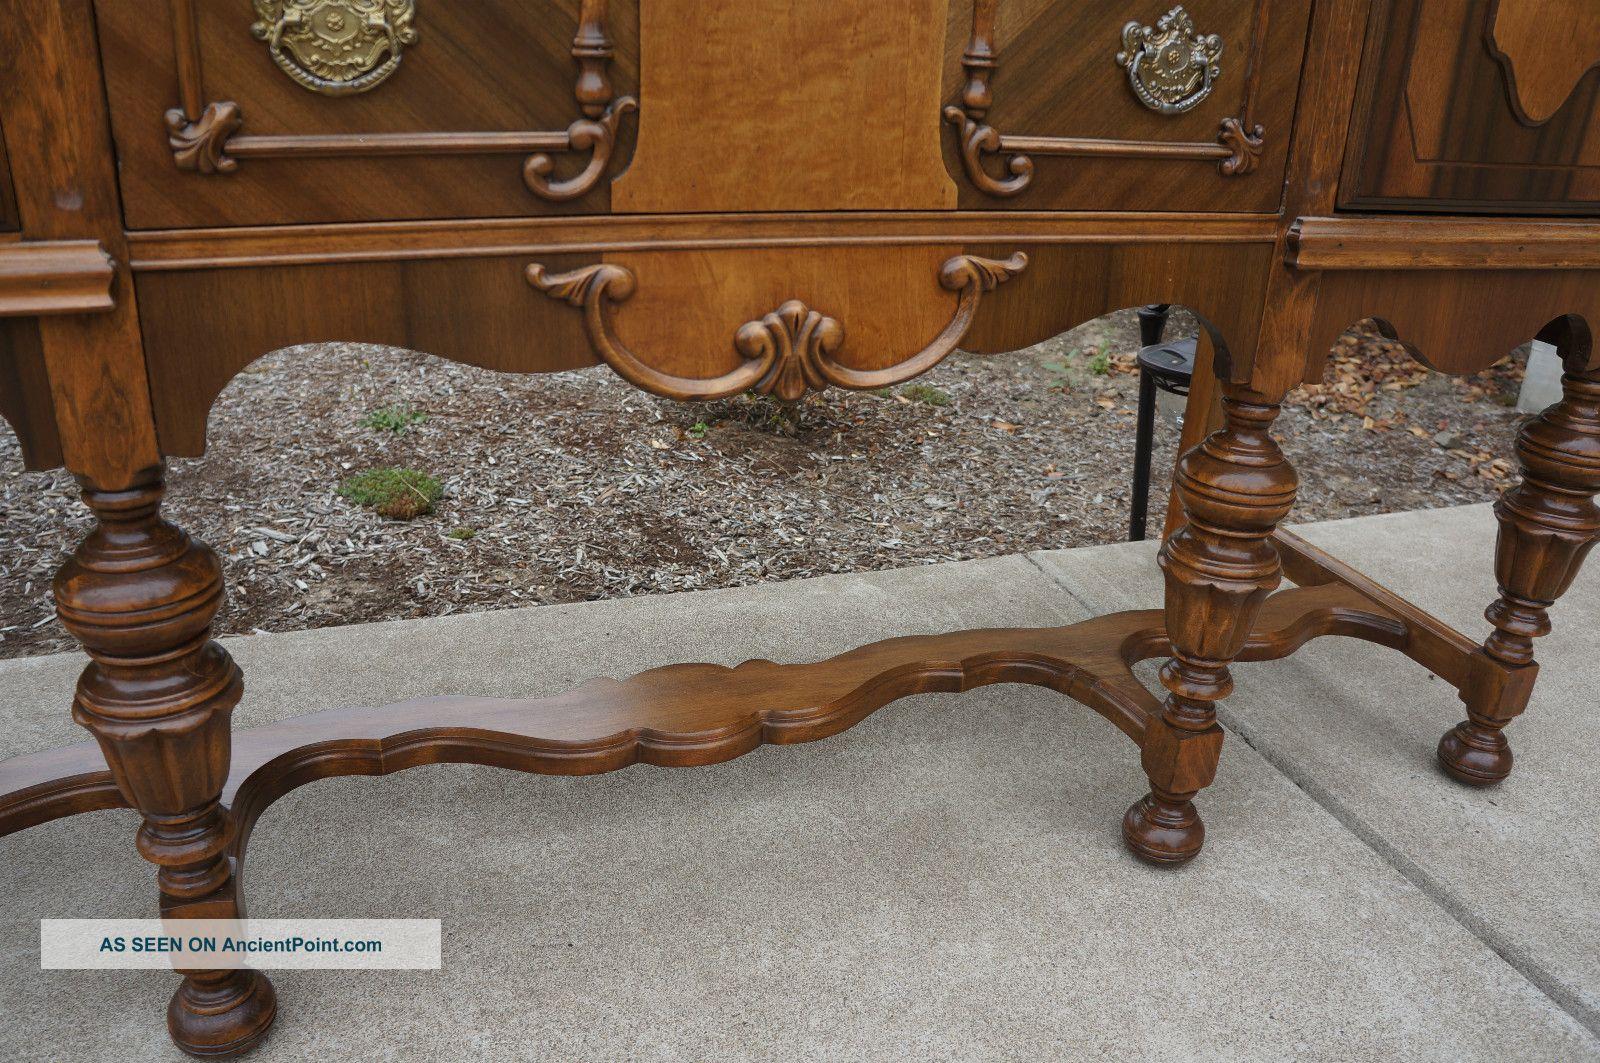 magnificent_antique_buffet__vintage_server__sideboard_buffet_11_lgw ...